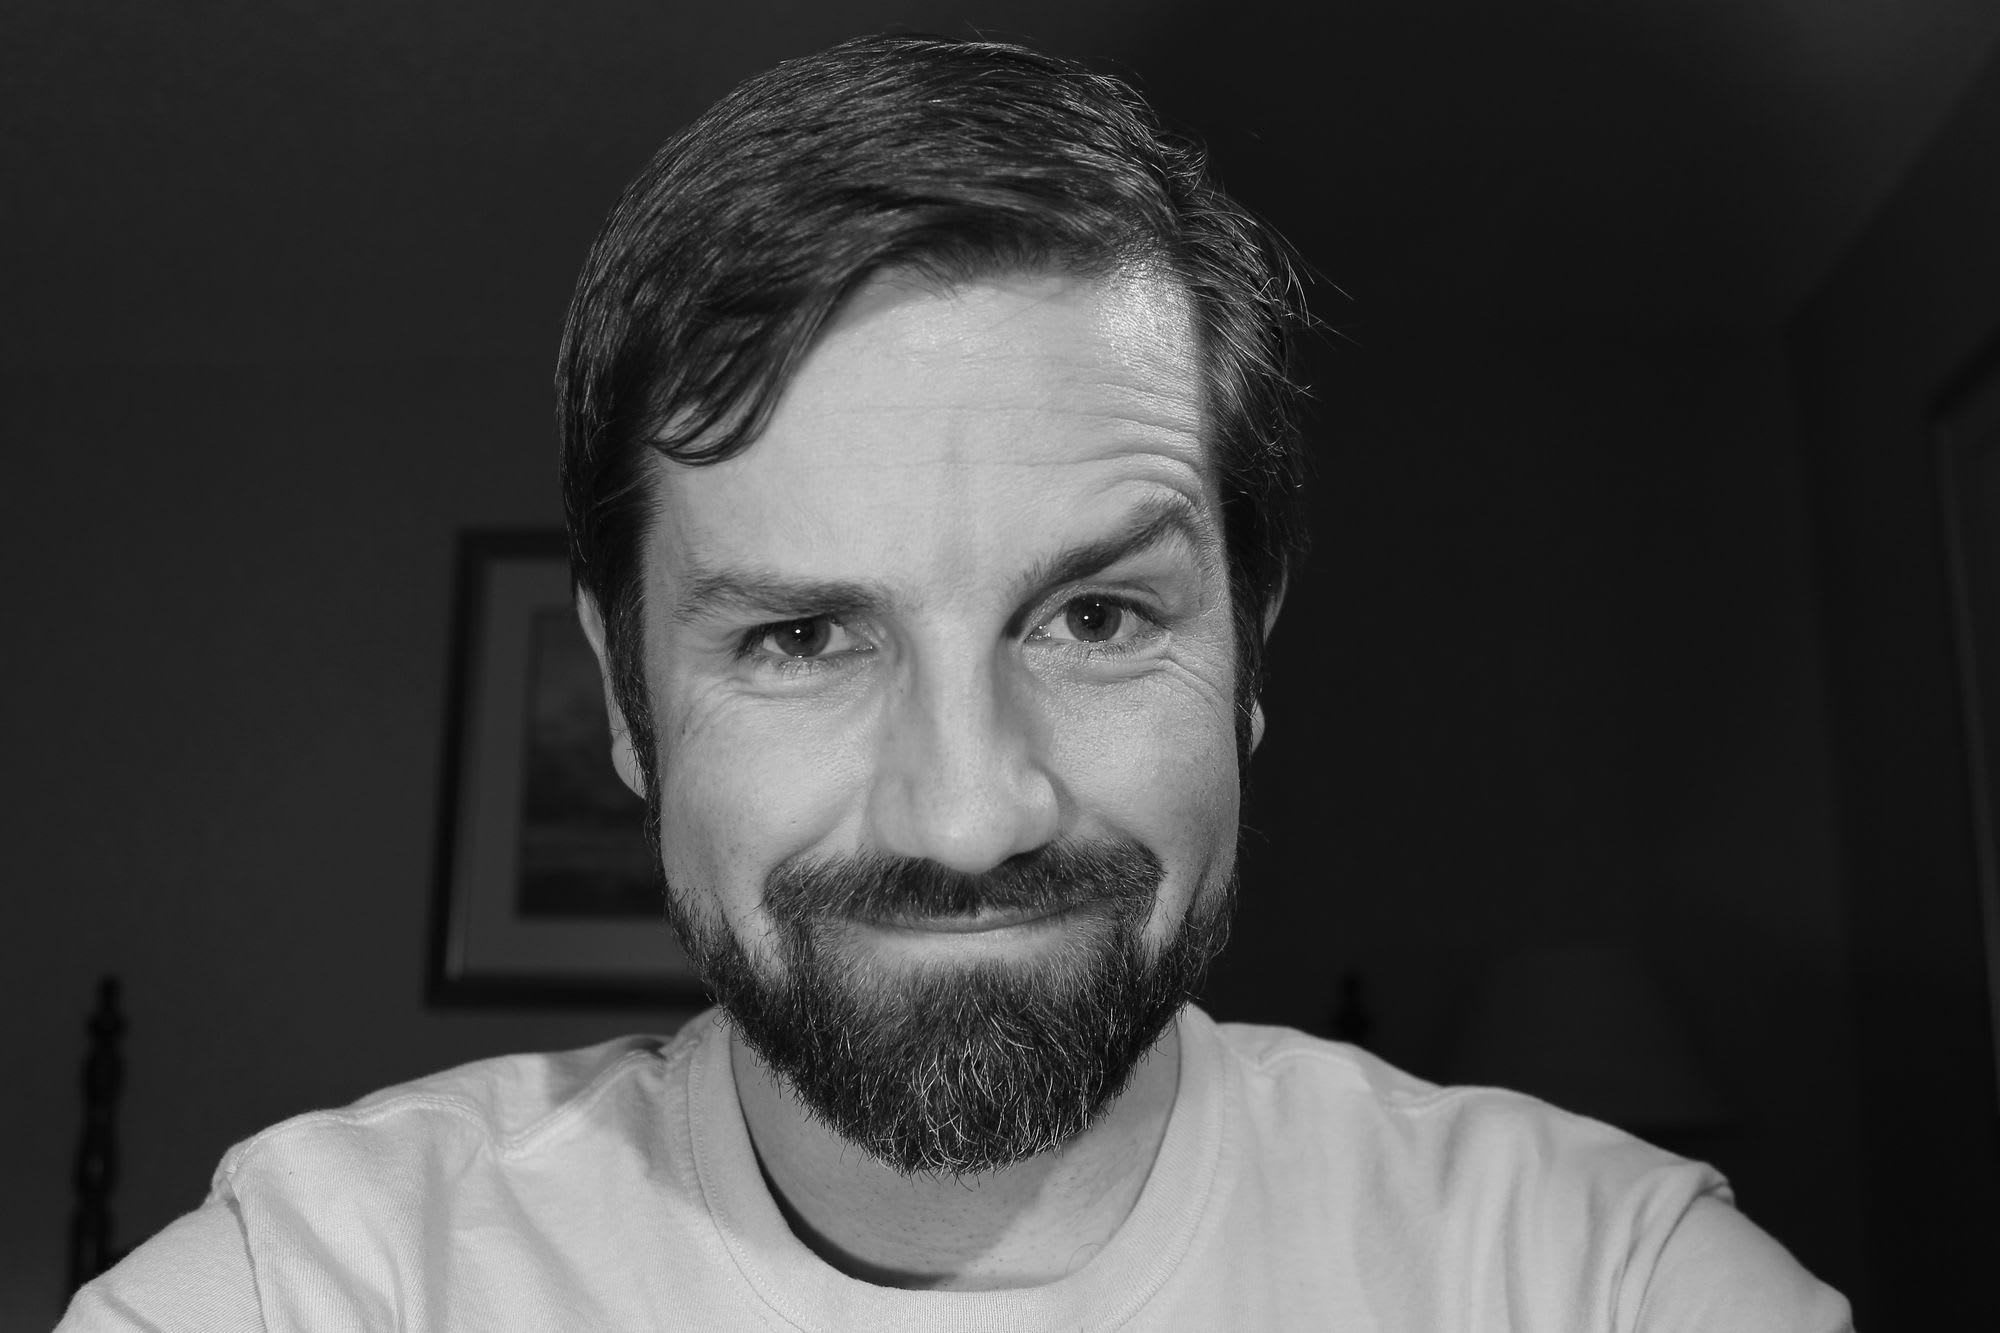 Monochrome Self Portraits